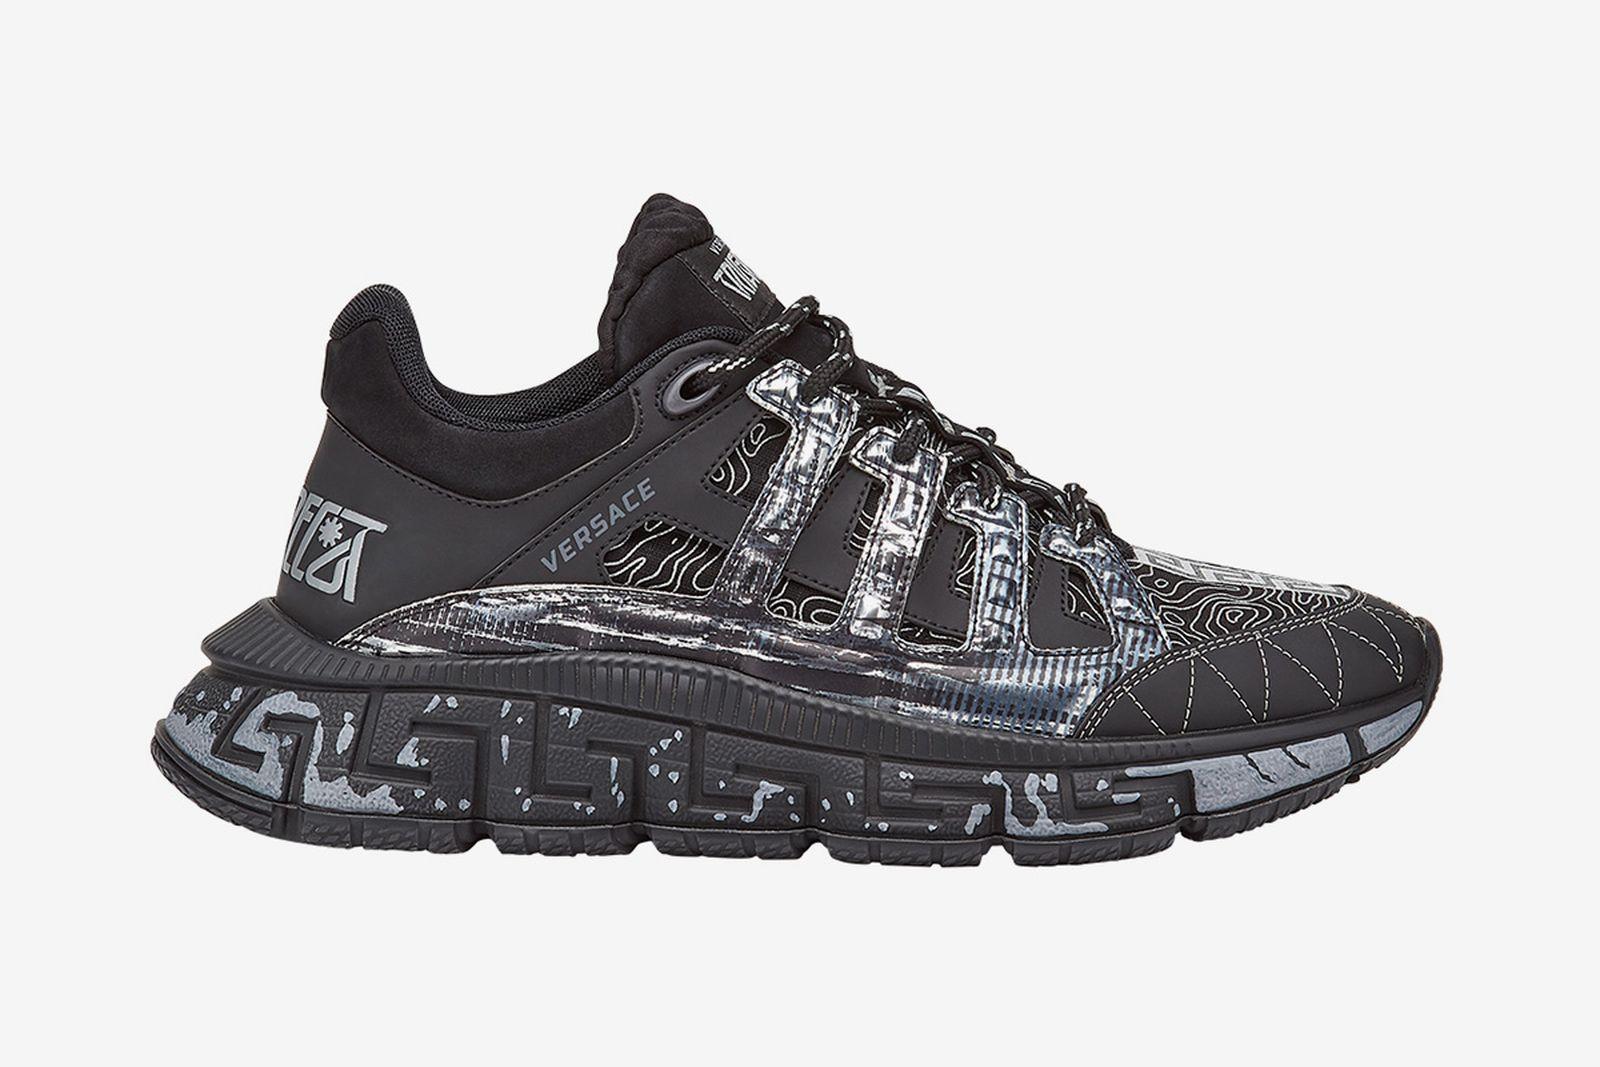 versace-trigreca-sneaker-release-date-price-05